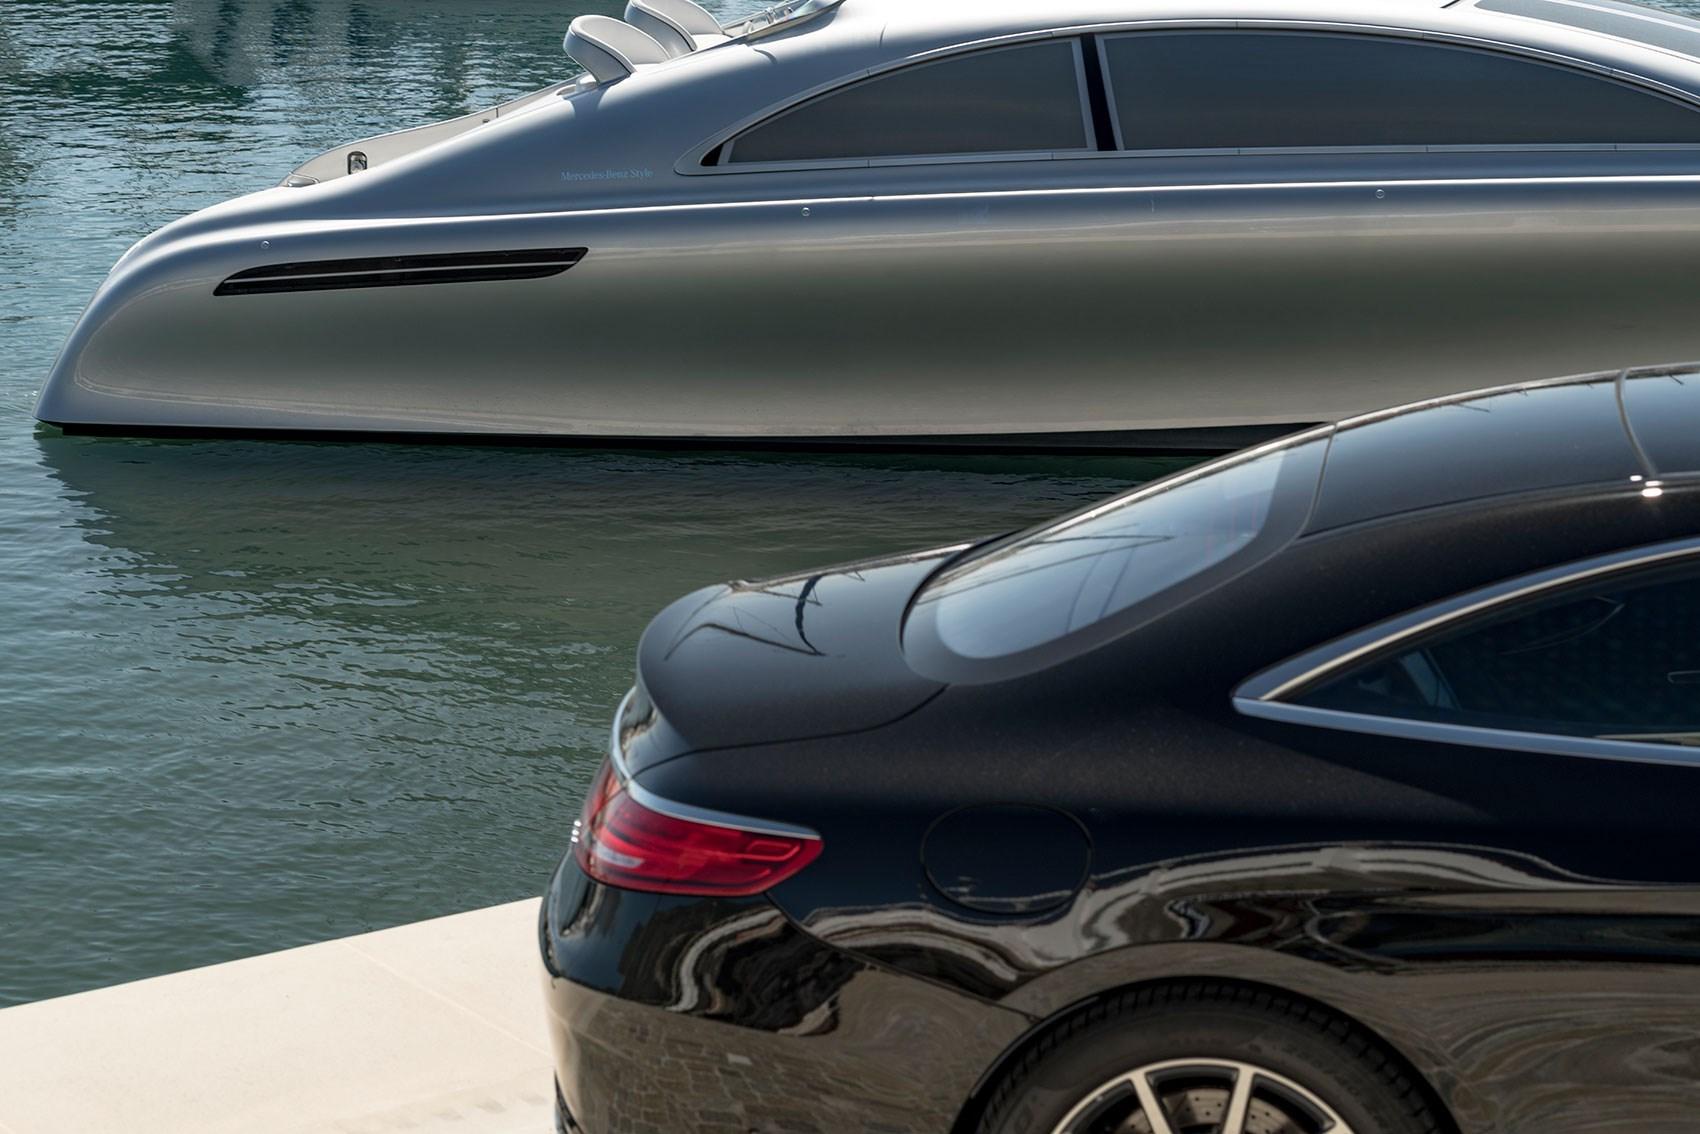 Mercedes Arrow460-Granturismo yacht and a Mercedes-AMG S63